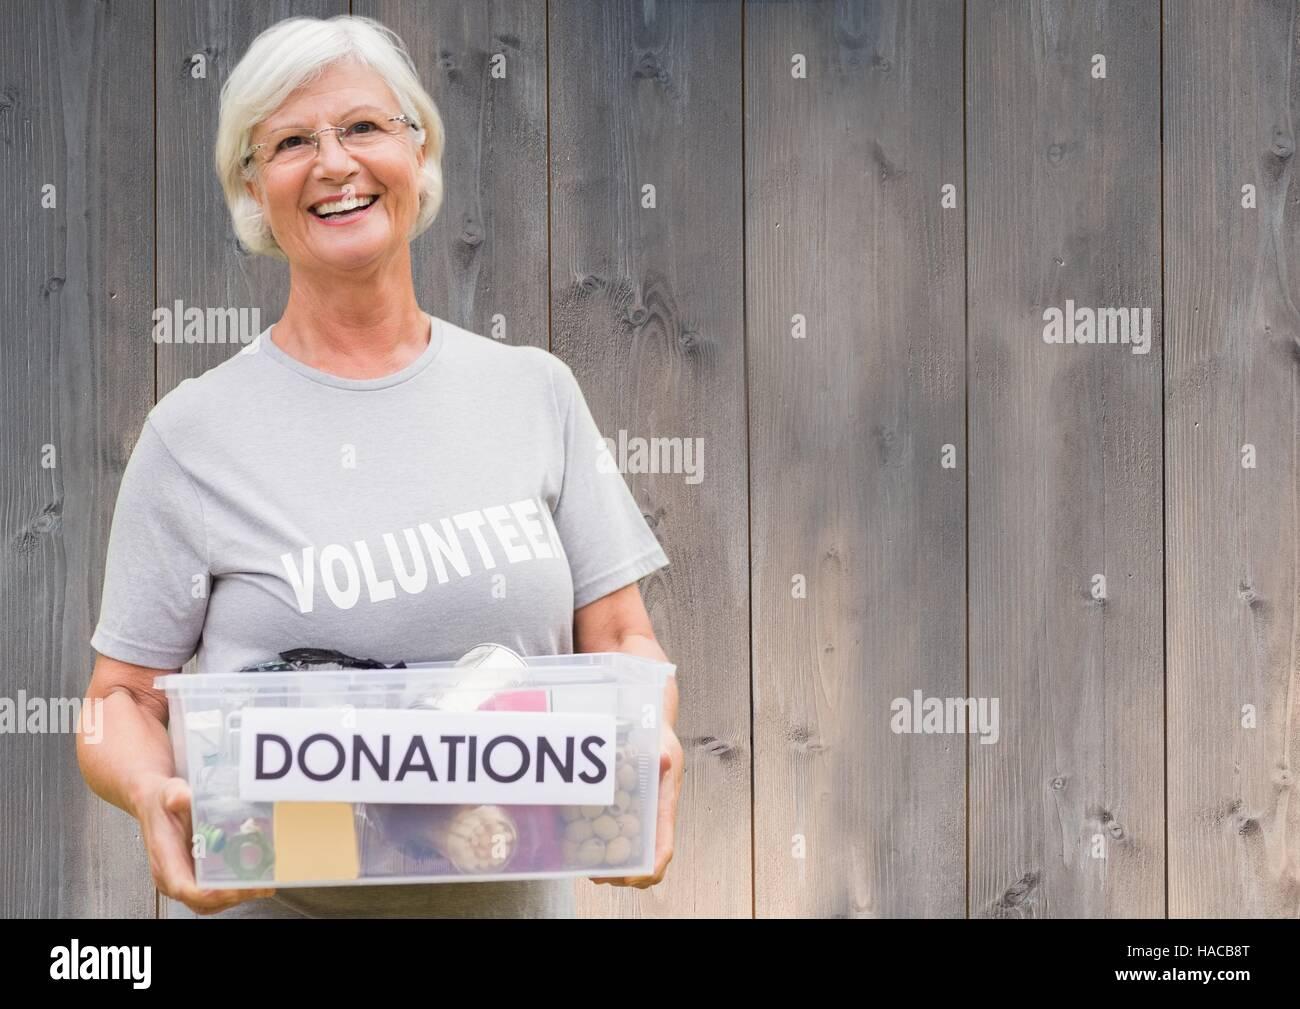 Smiling female volunteer holding donations box - Stock Image